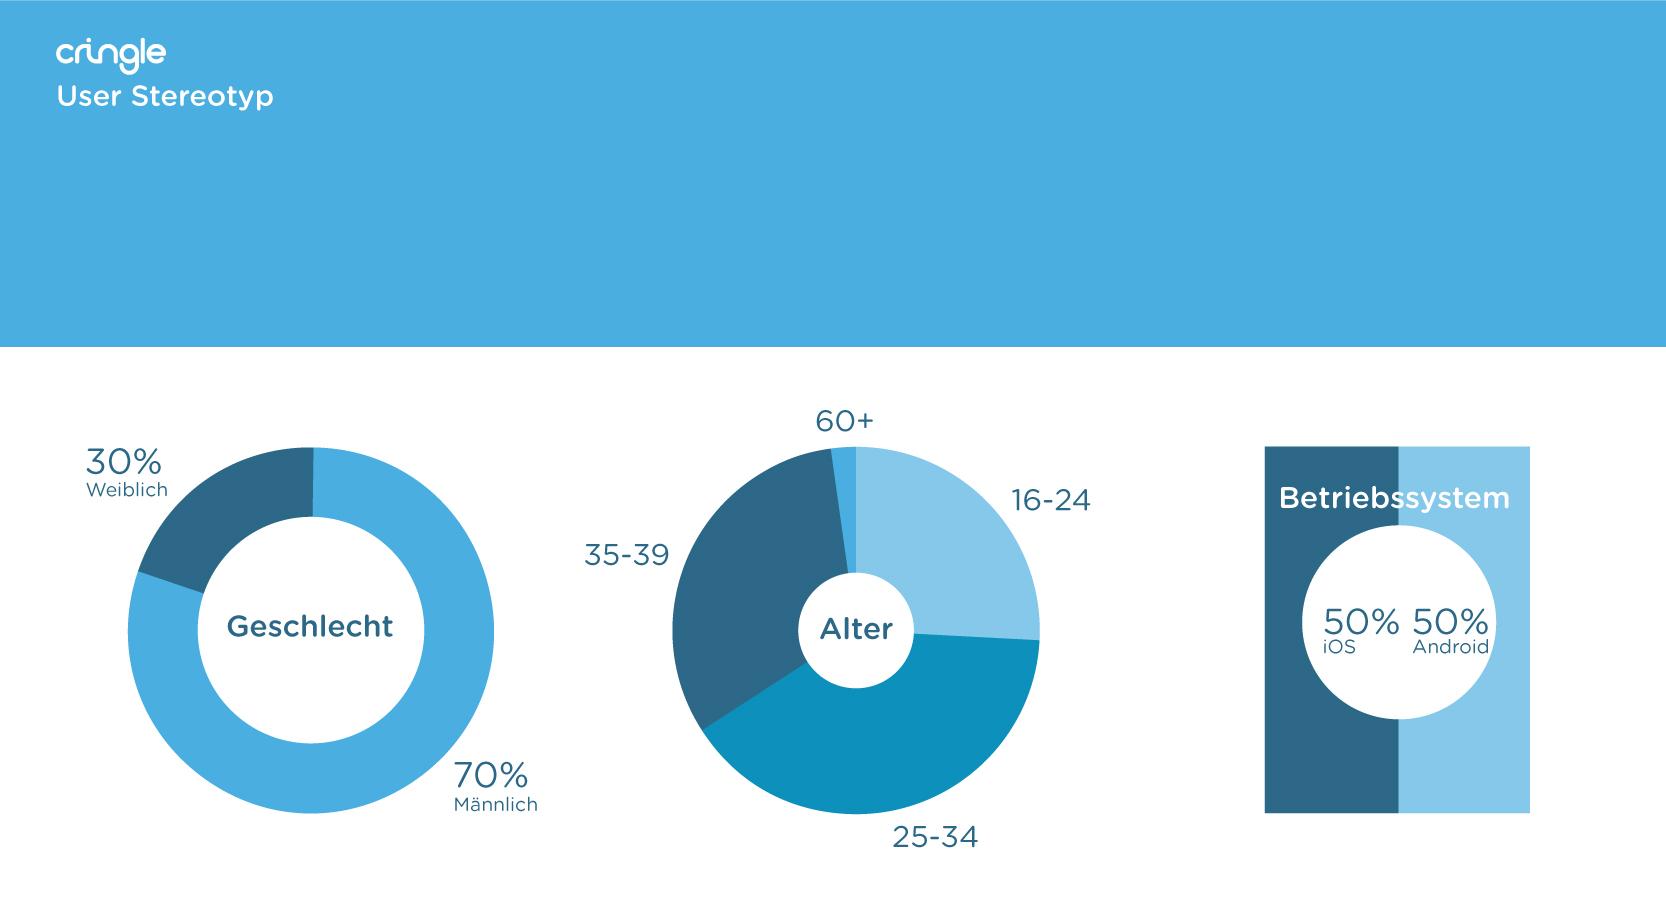 USER-STEREOTYP (Geschlechterverteilung: 70% m / 30% w; Alter: 16-24=26%, 25-34=40%, 35-59=32%, 60+=2%; OS: 50% iOS, 50% Android